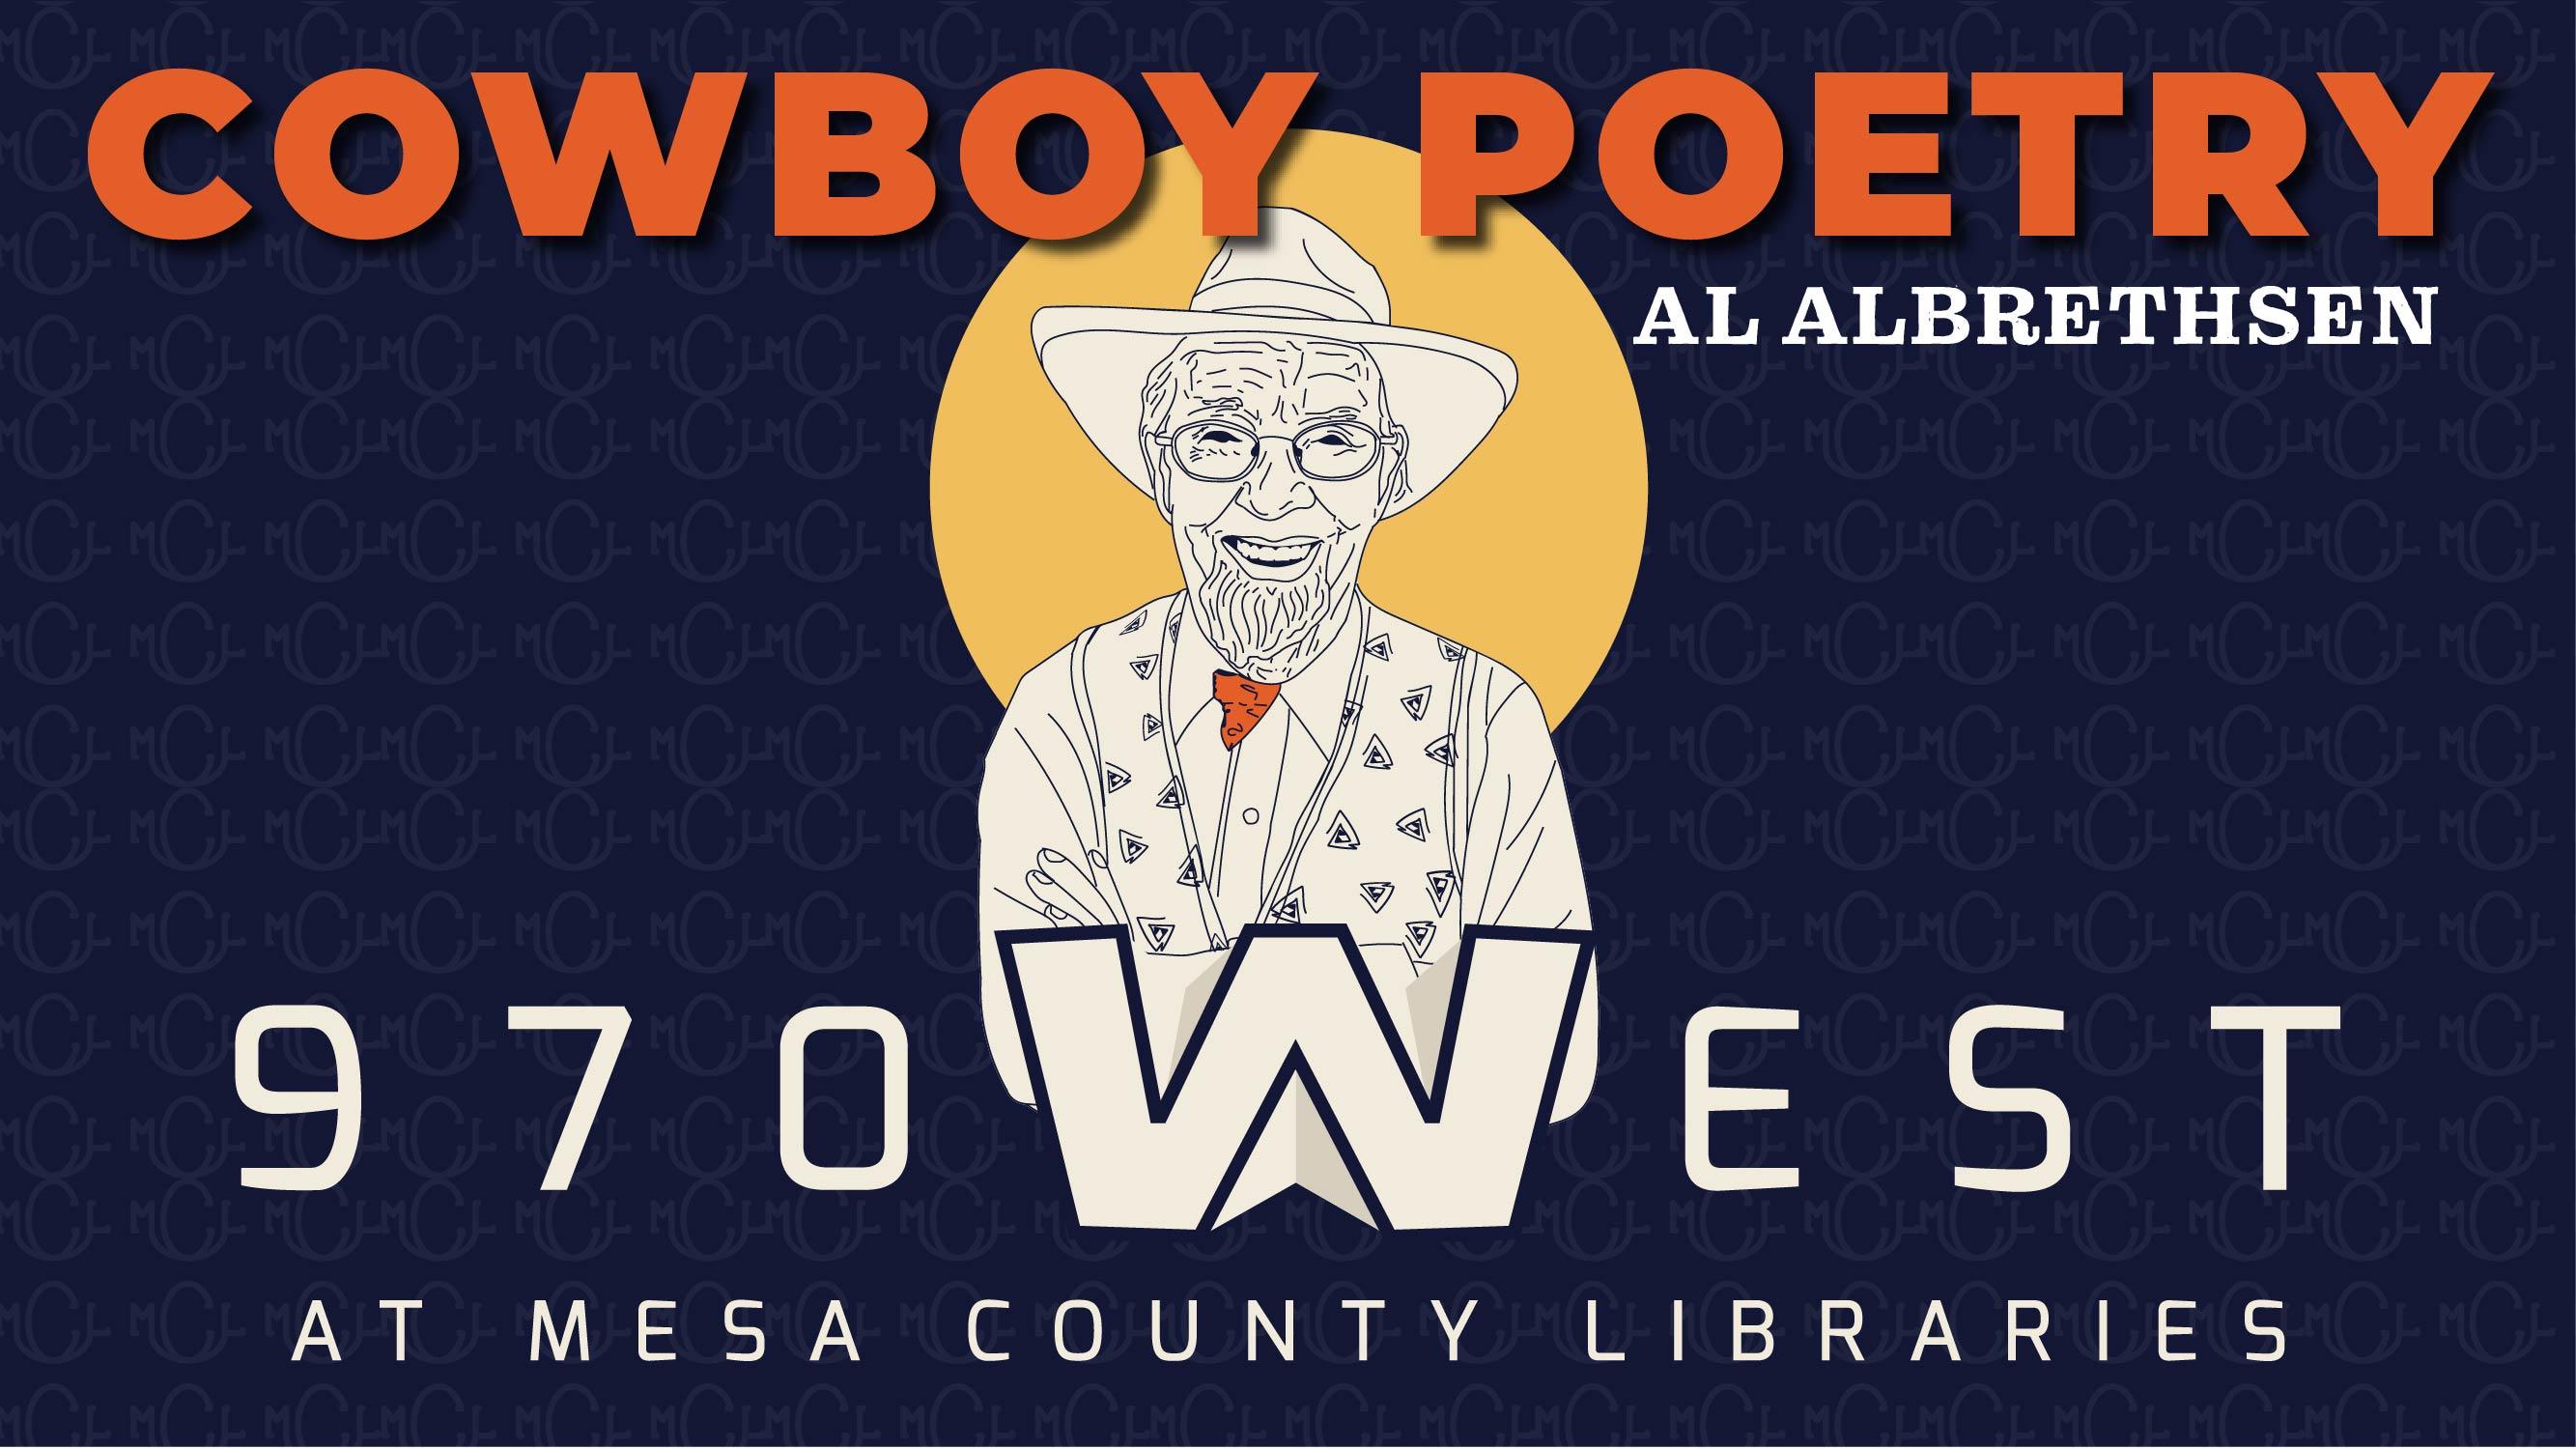 Cowboy Poetry - Al Albrethson|urlencode